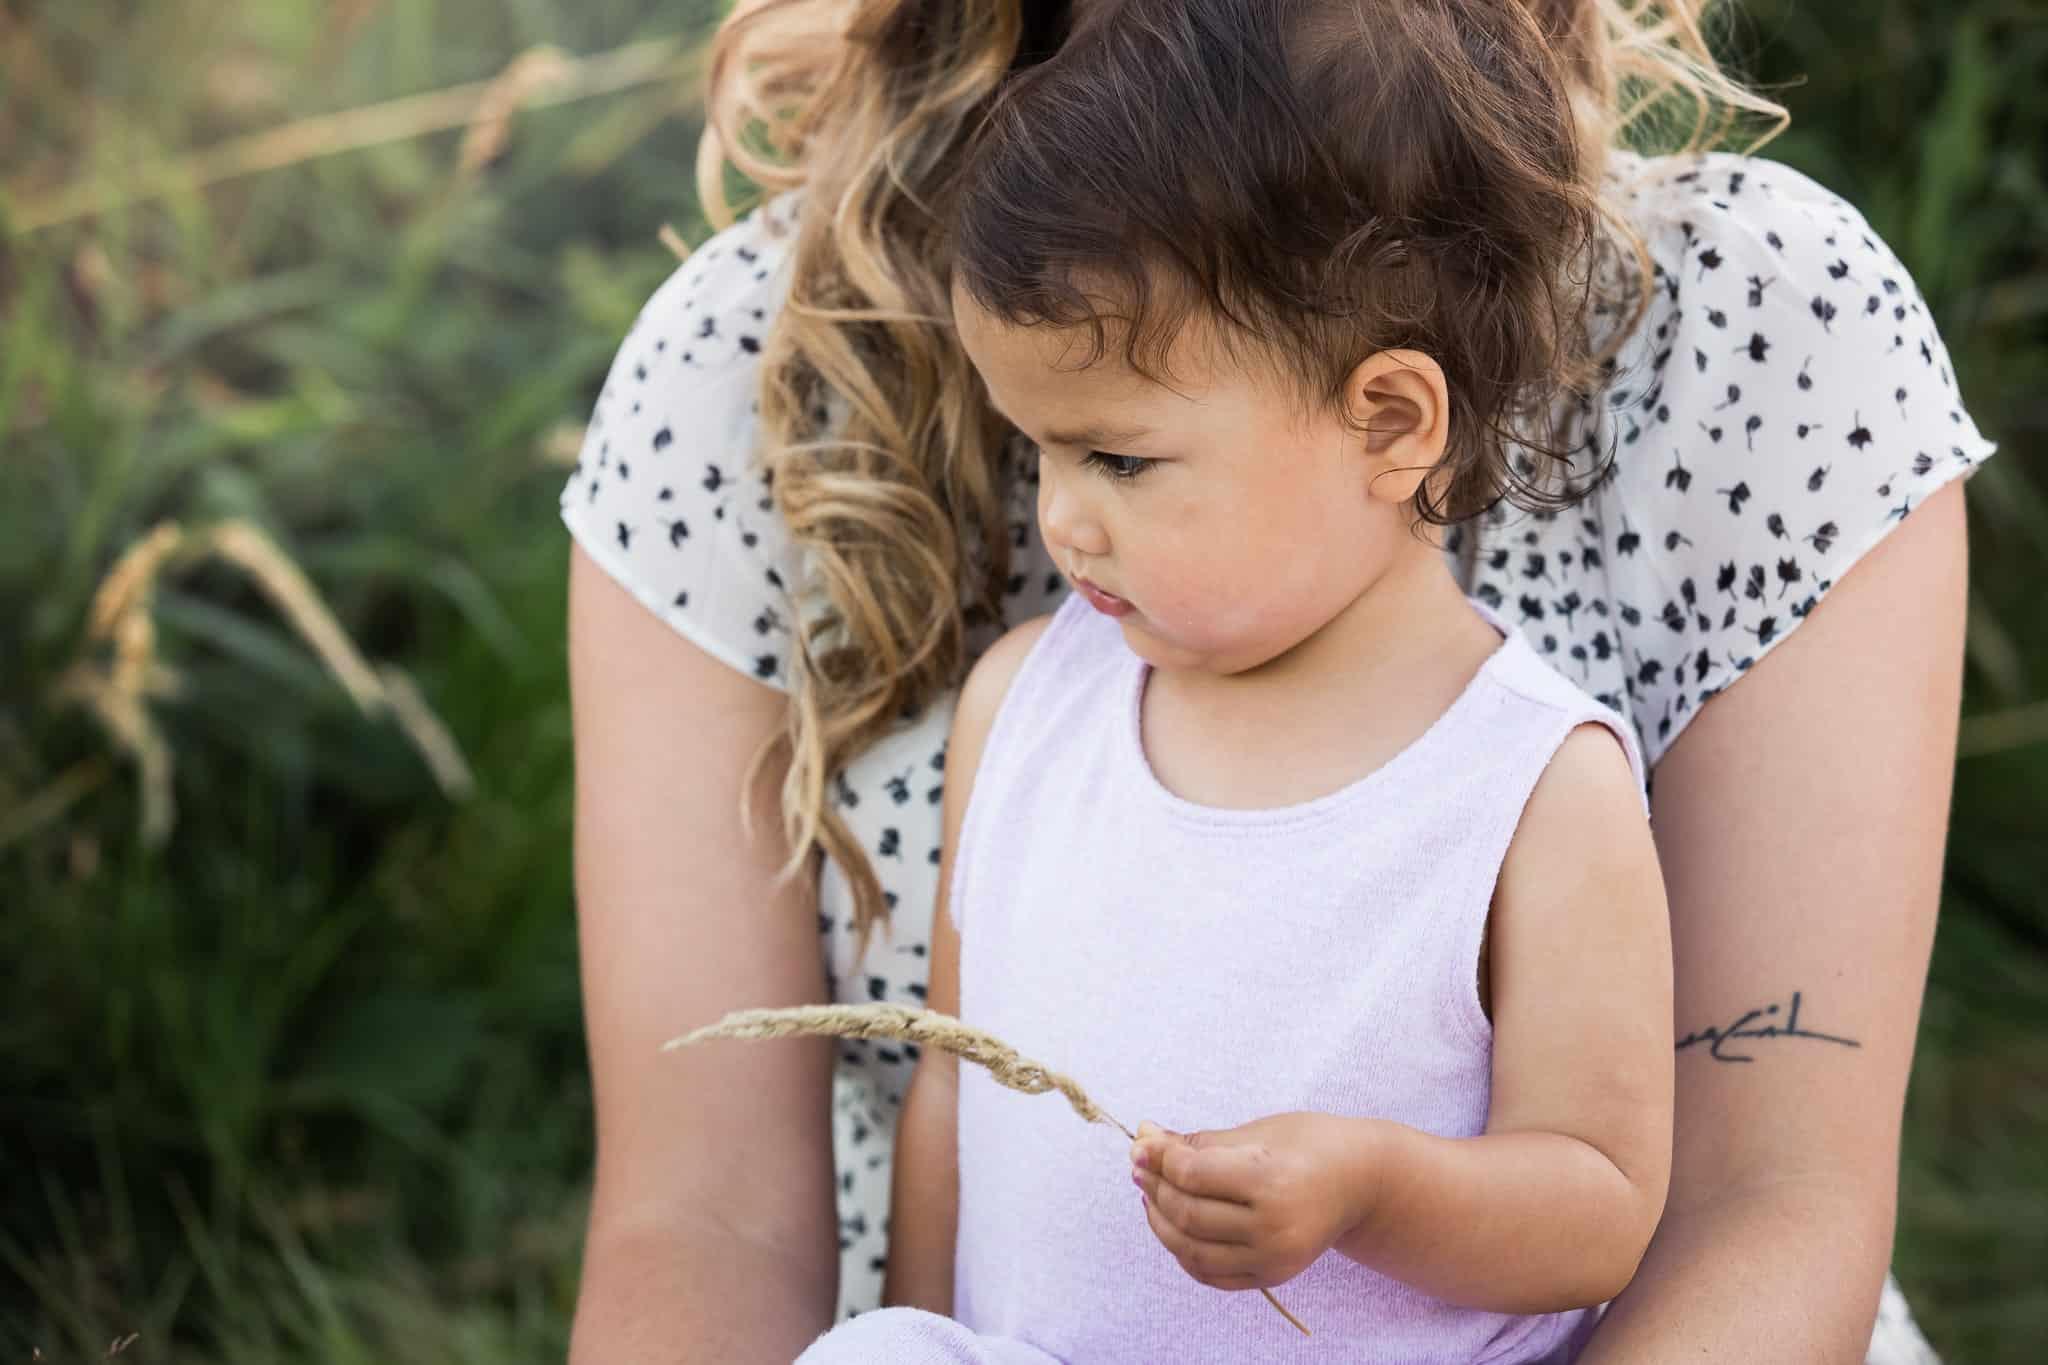 mom holding little girl picking grass in her lap